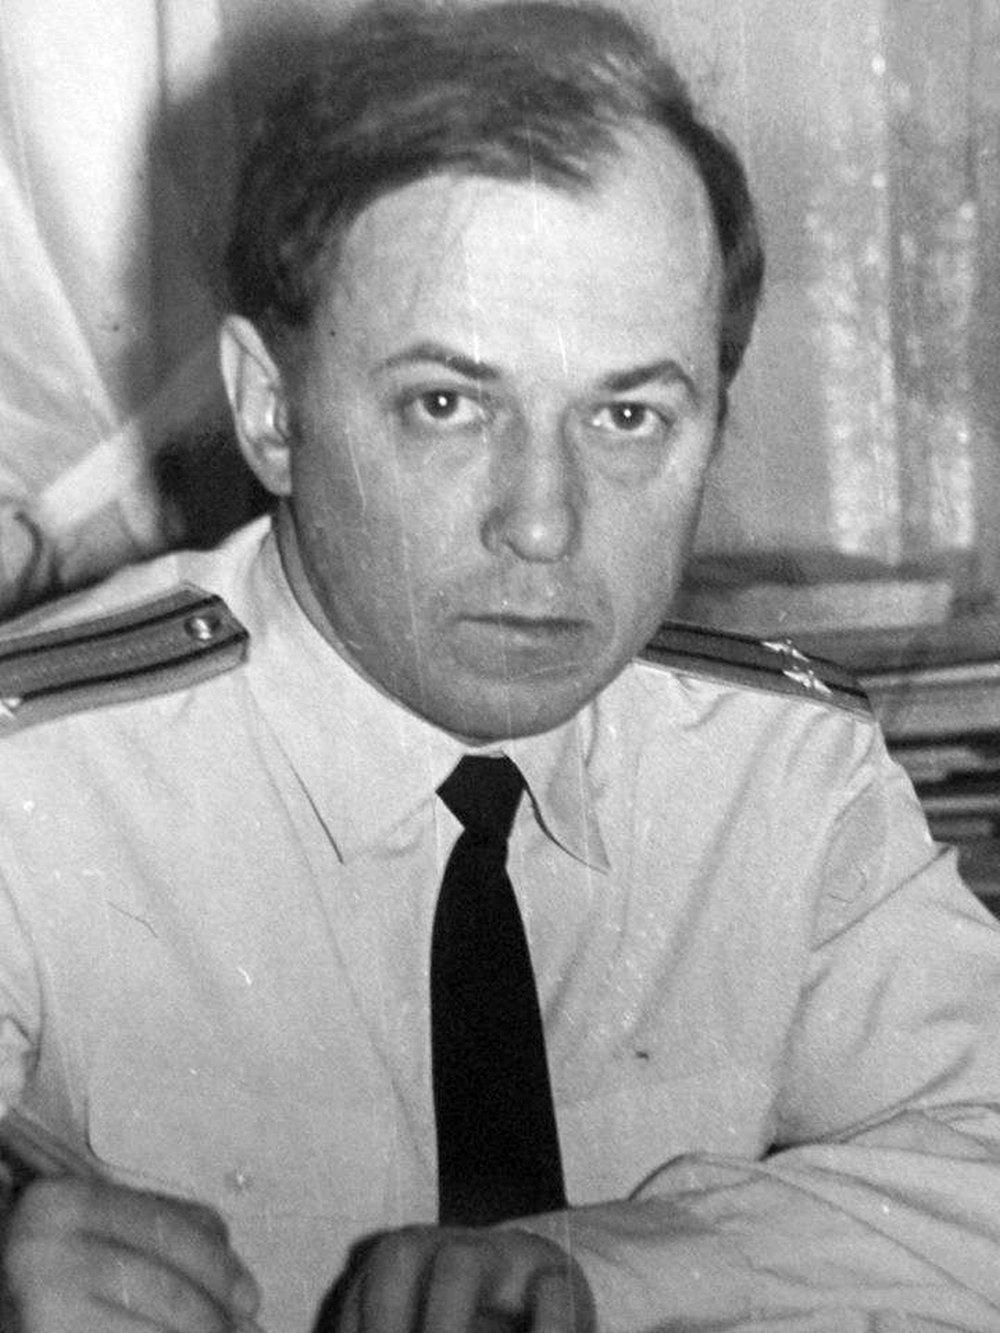 "Командир АПЛ К-278 ""Комсомолец"" Евгений Ванин. / из личного архива"